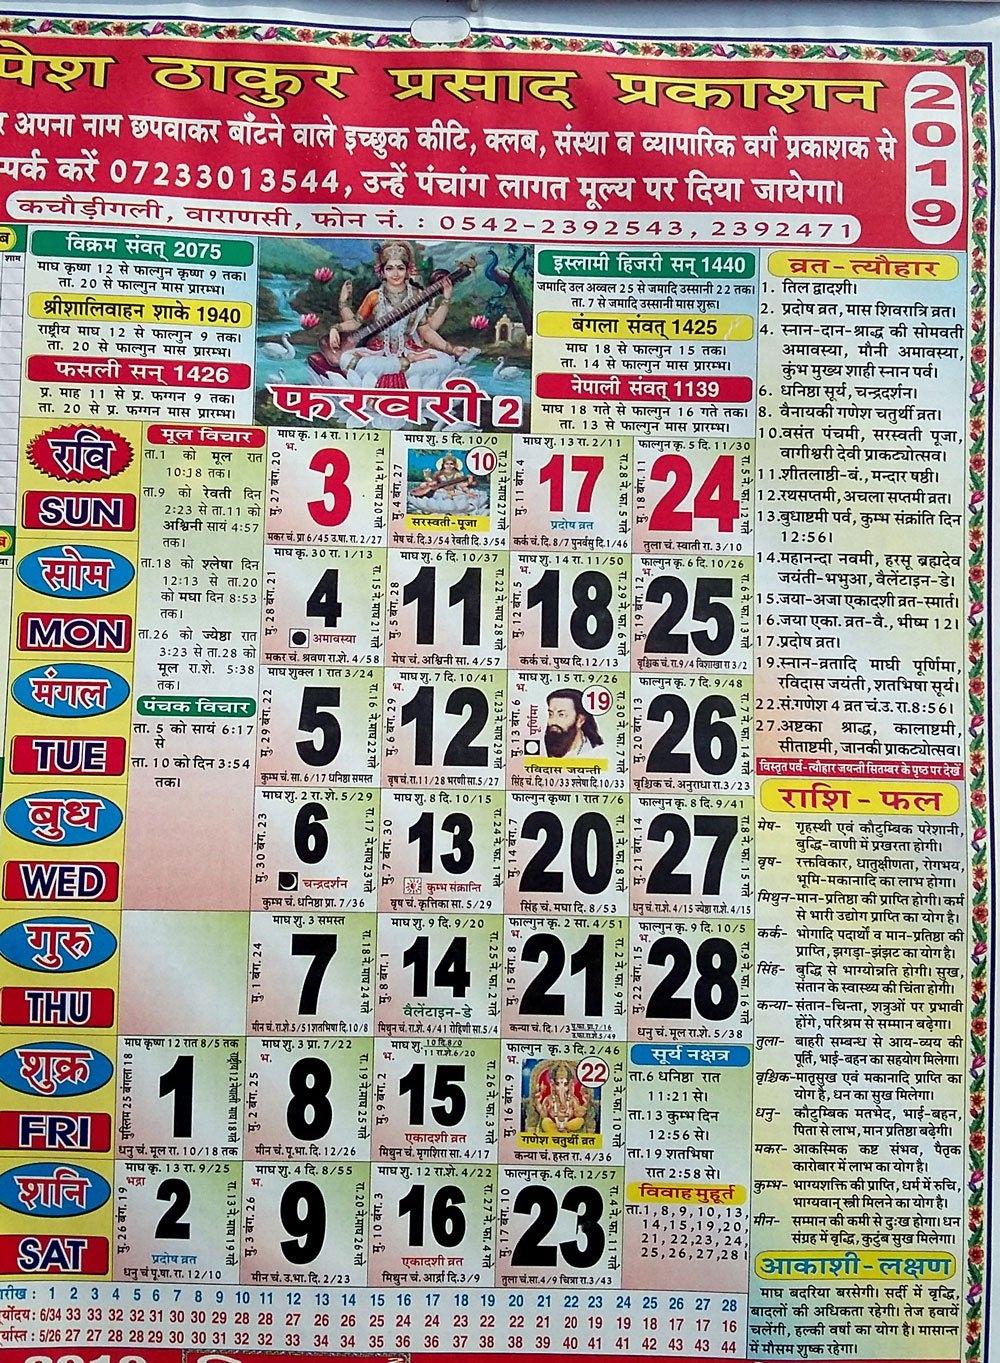 Thakur Prasad Calendar 2019 Pdf Free Download Calendar 2019 Ka Hindi Mein